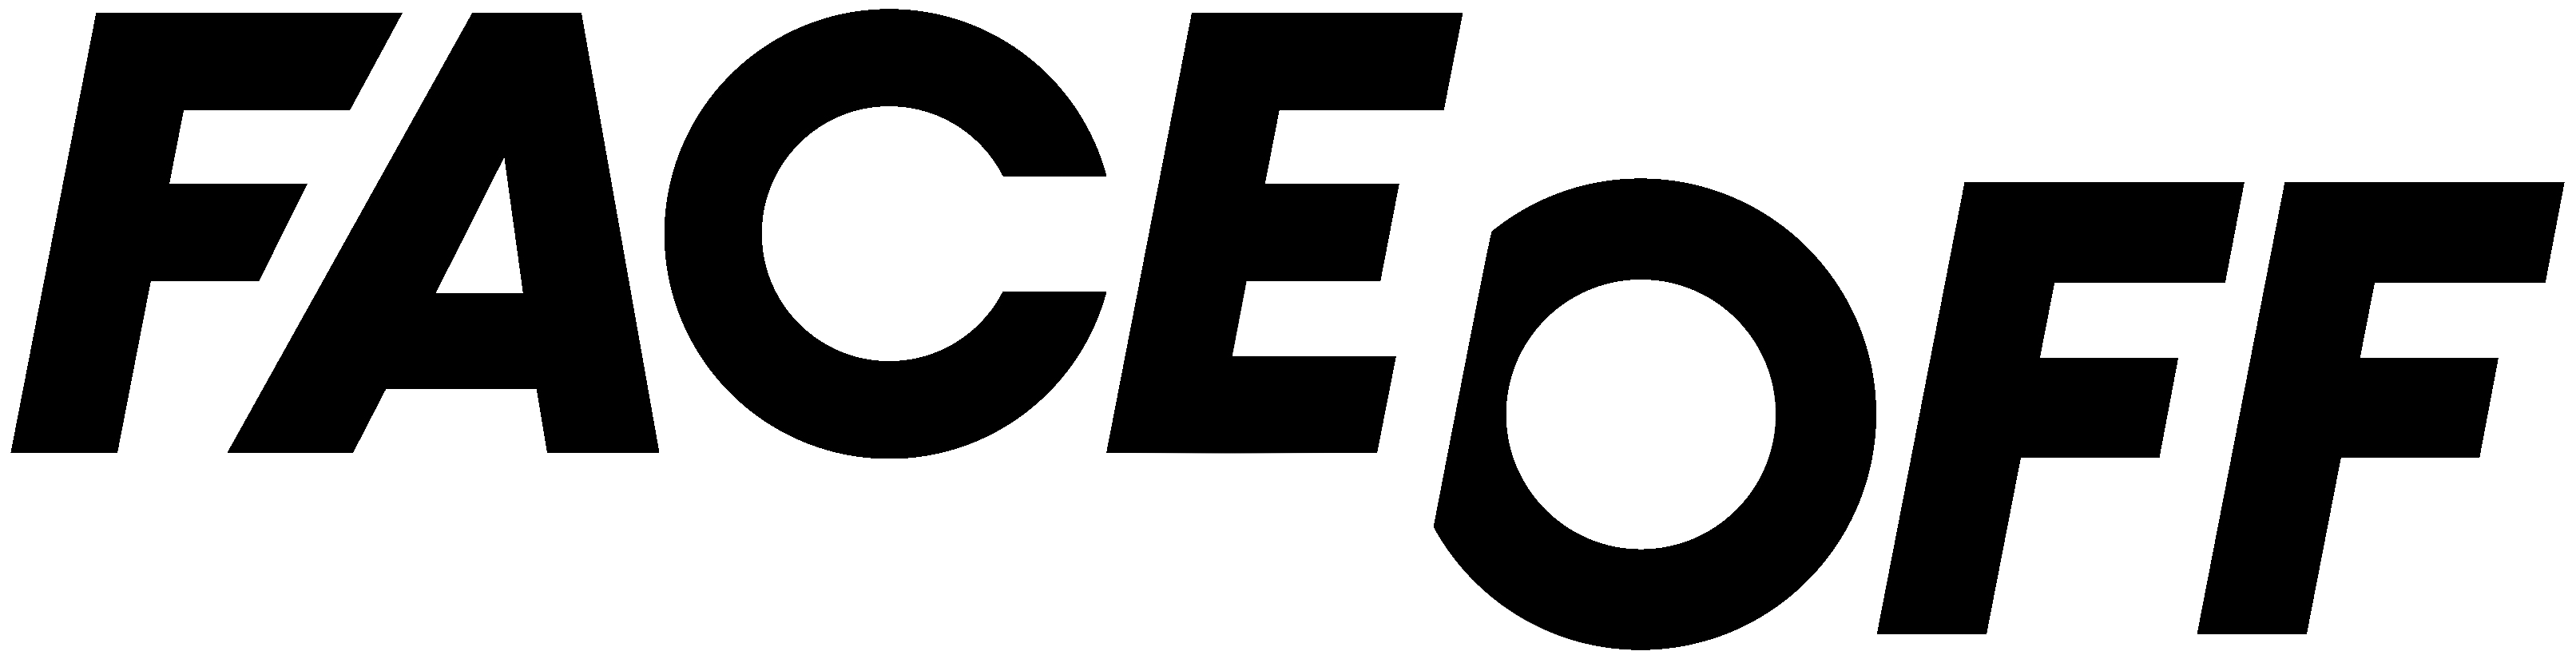 Helix Design Pattern